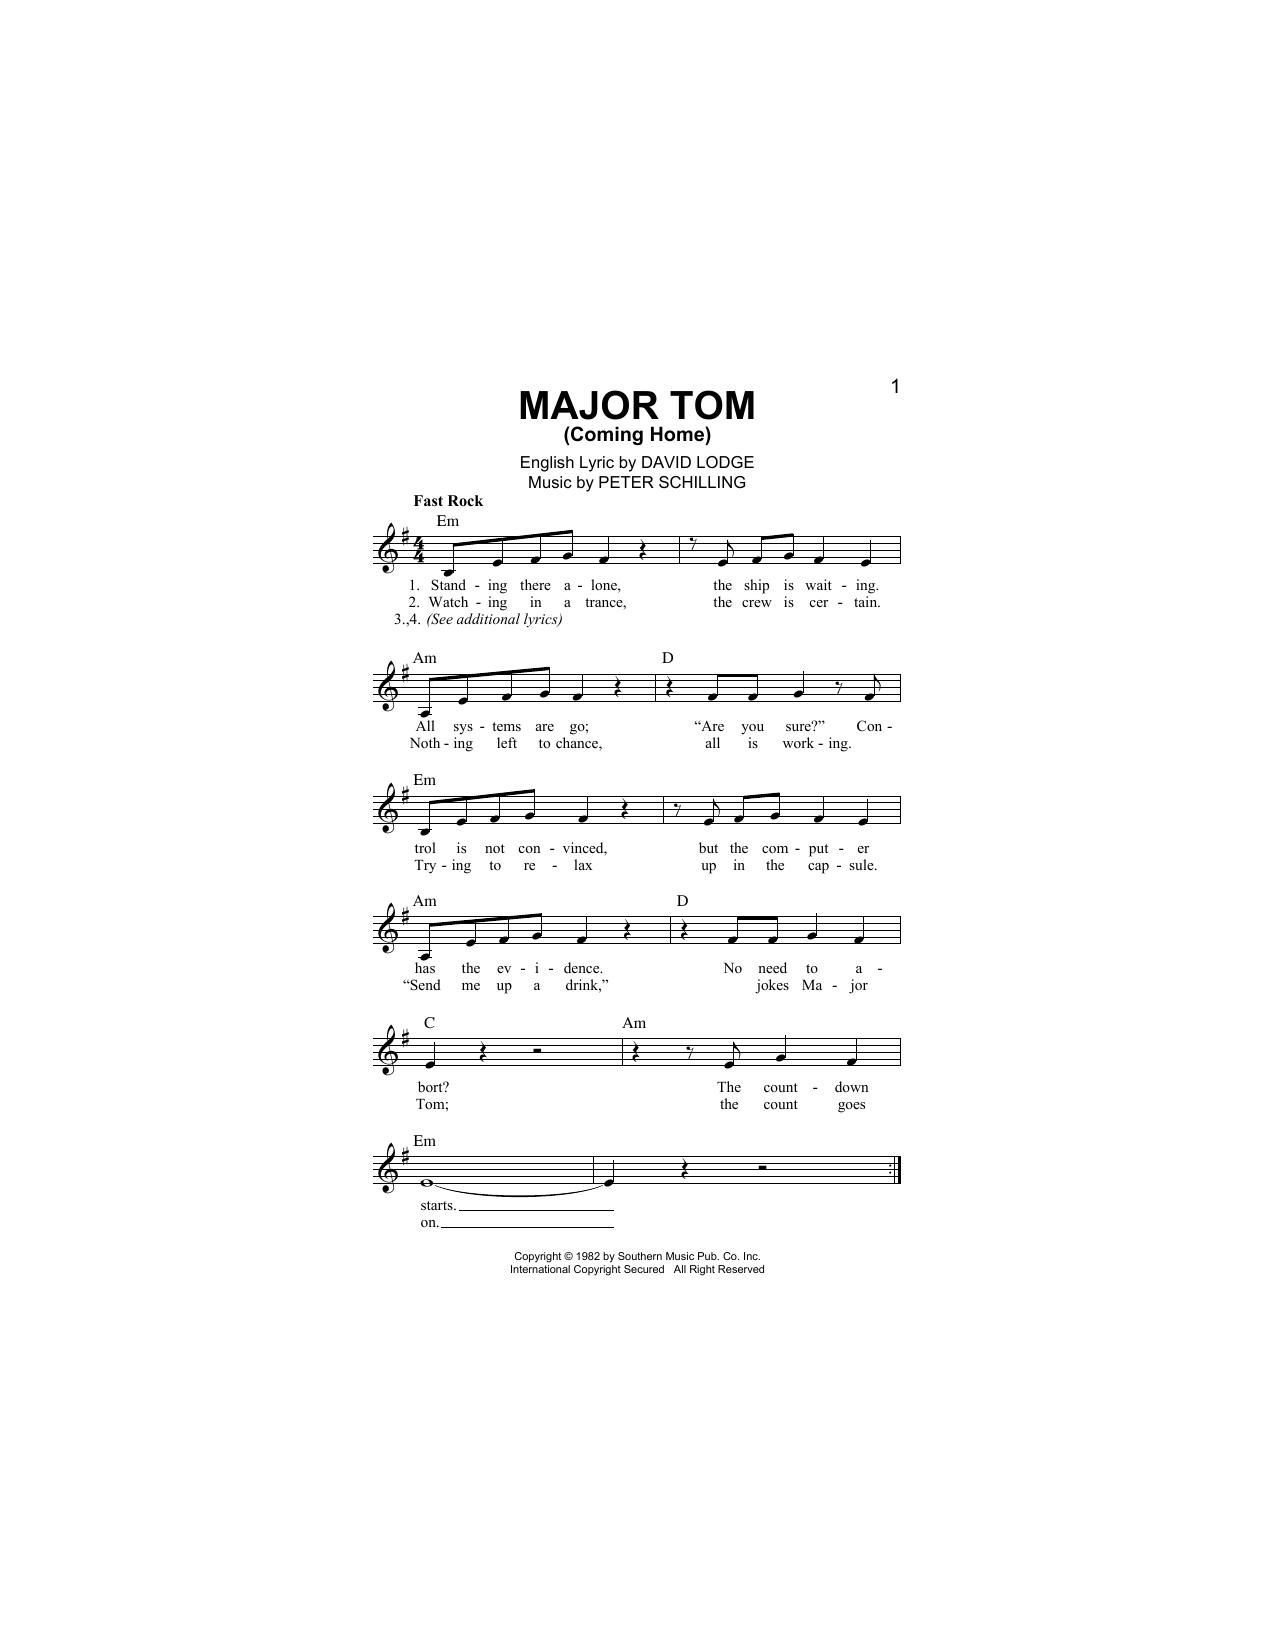 Peter Schilling Major Tom Coming Home Sheet Music Notes, Chords    Download Printable Lead Sheet / Fake Book PDF Score   SKU 15